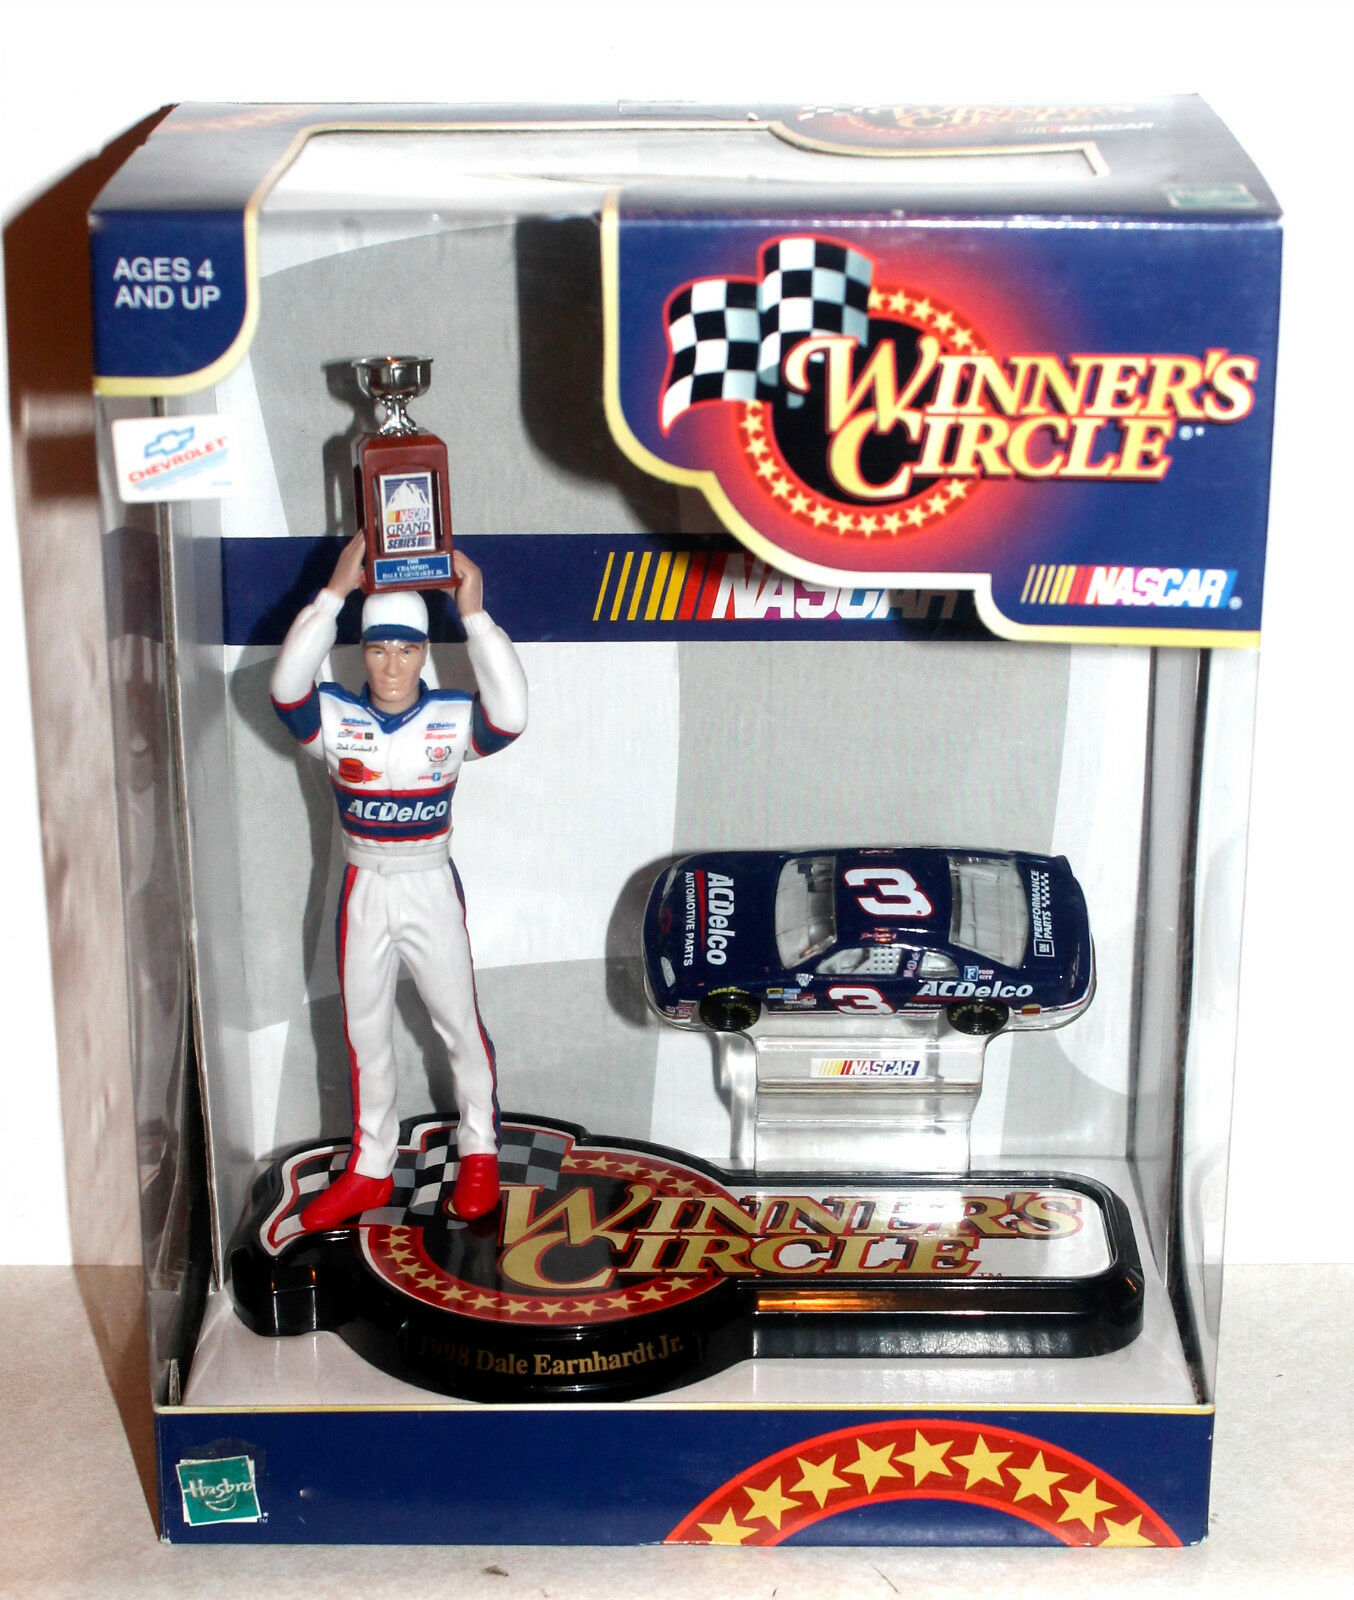 RARE BUSCH CHAMPION Dale Earnhardt Jr. 1998 WinNER's CIRCLE NASCAR Hasbro NIB